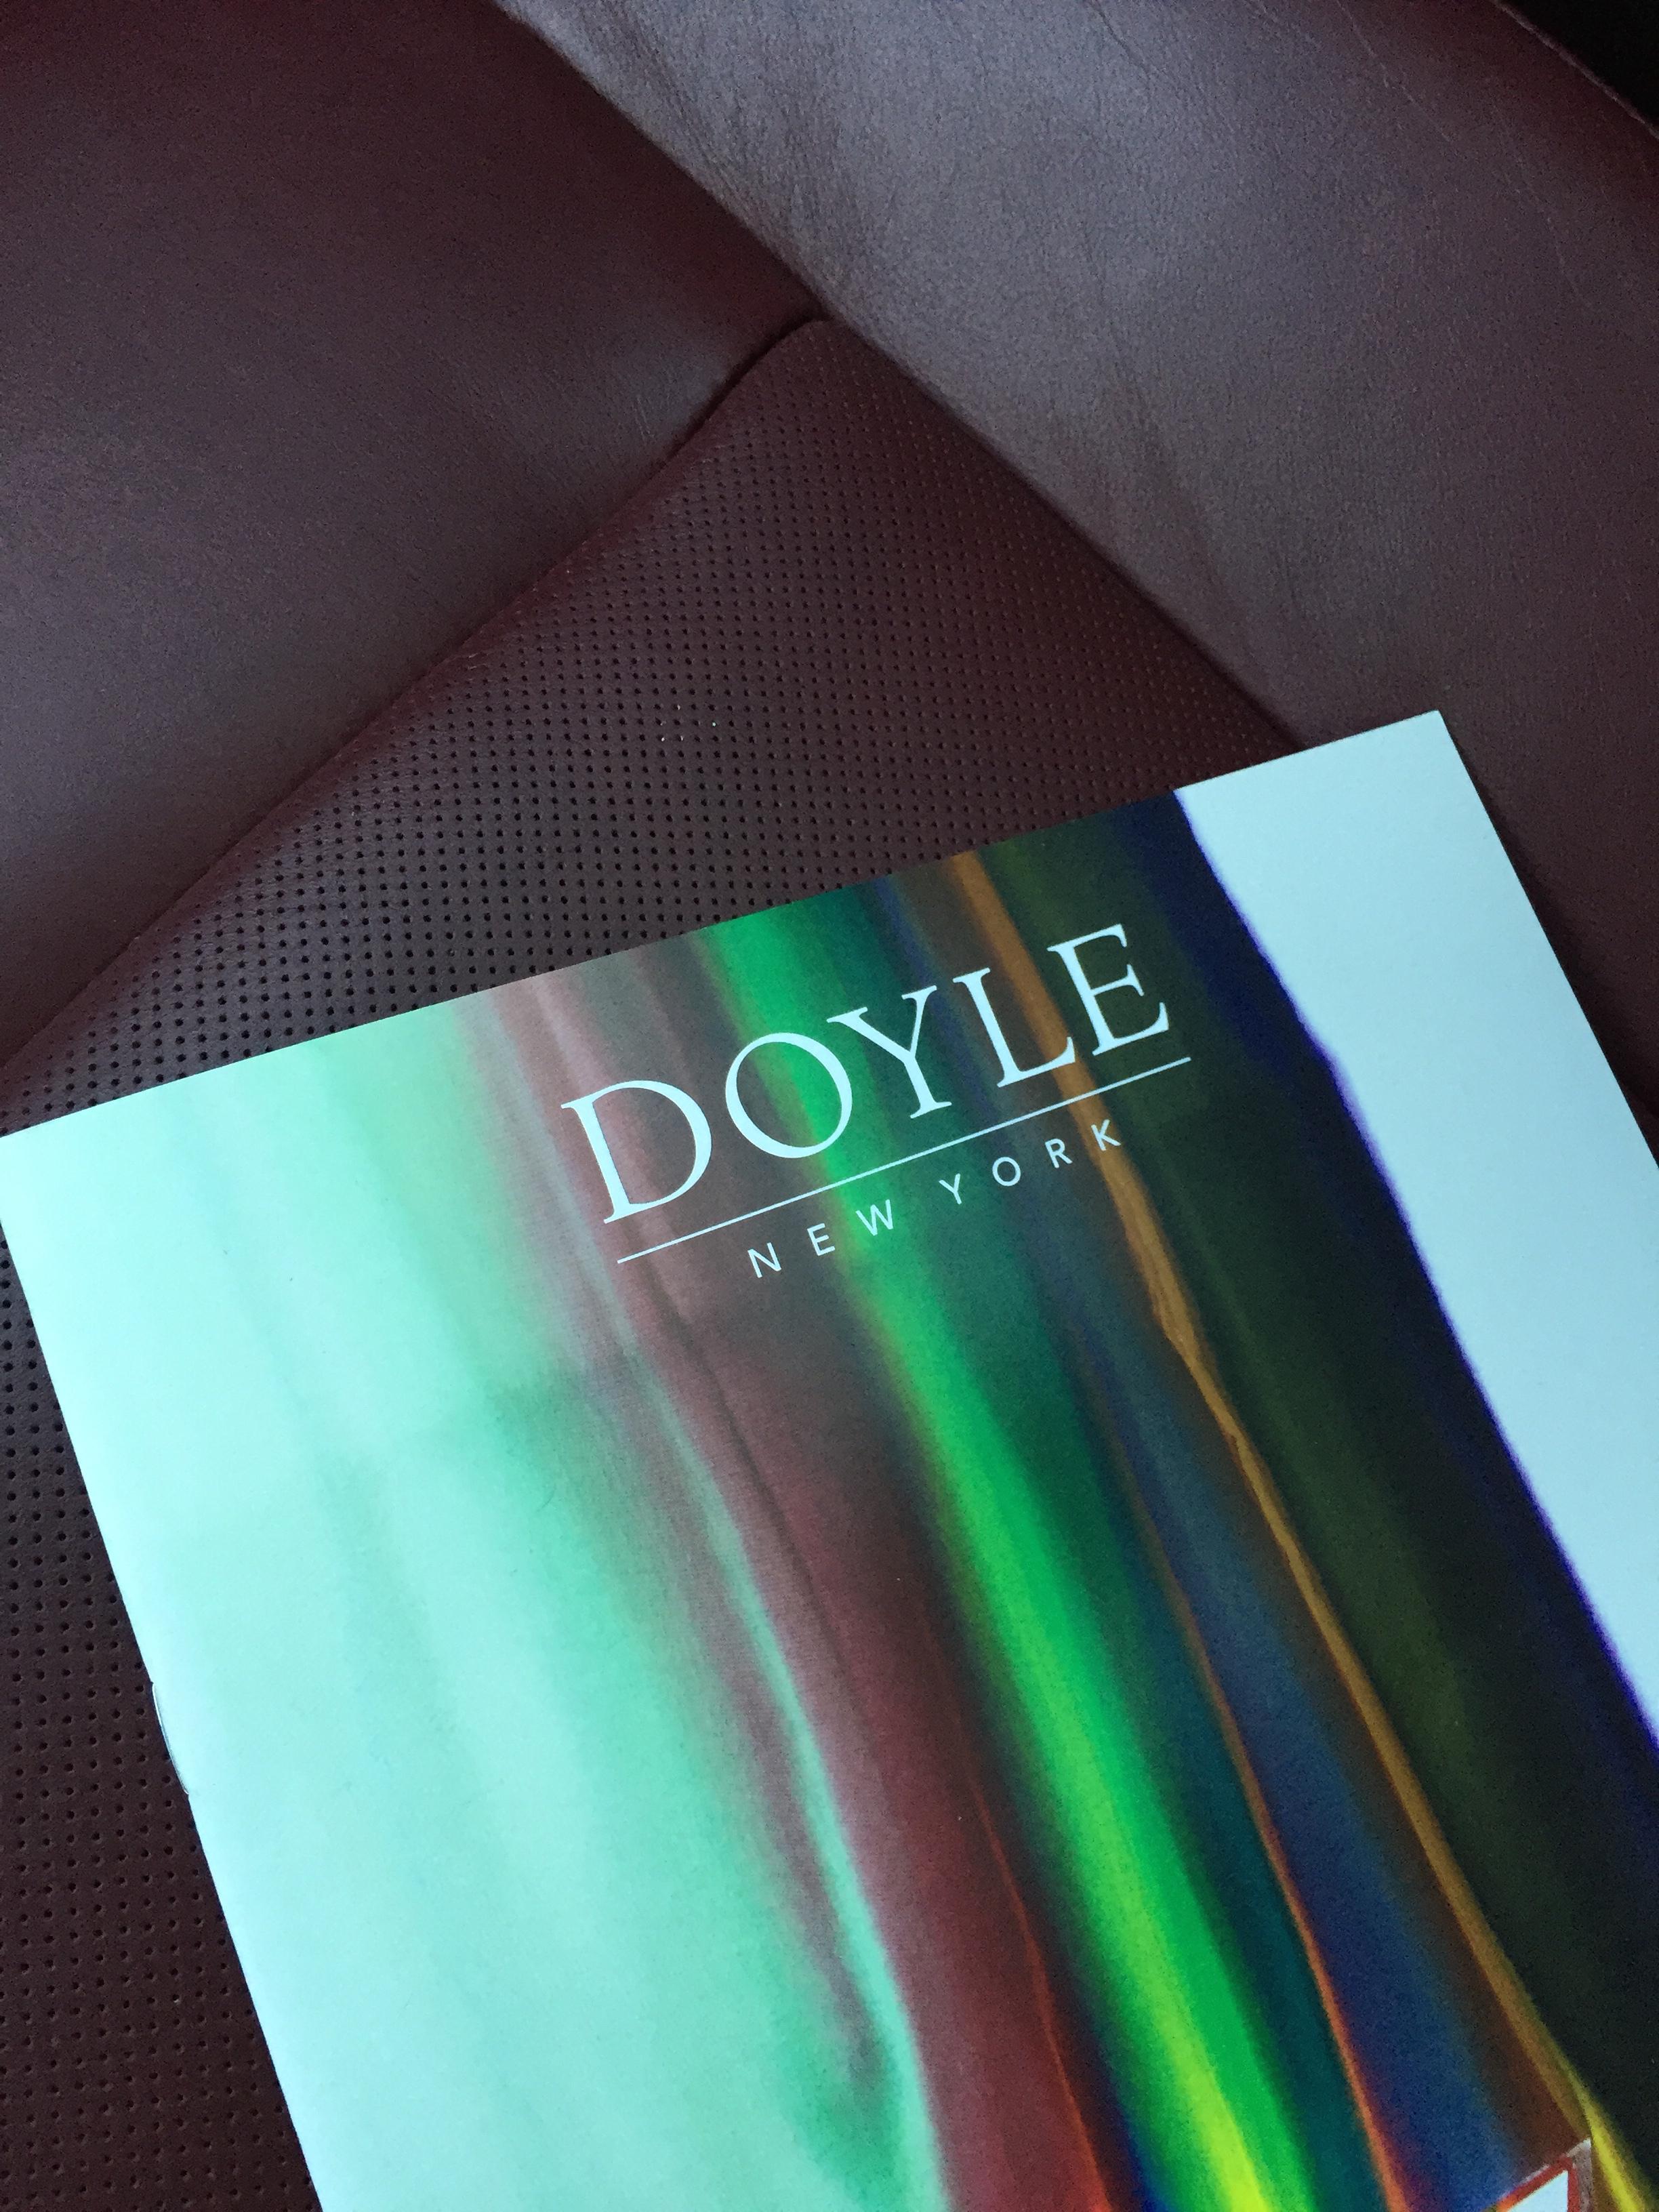 Doyle book